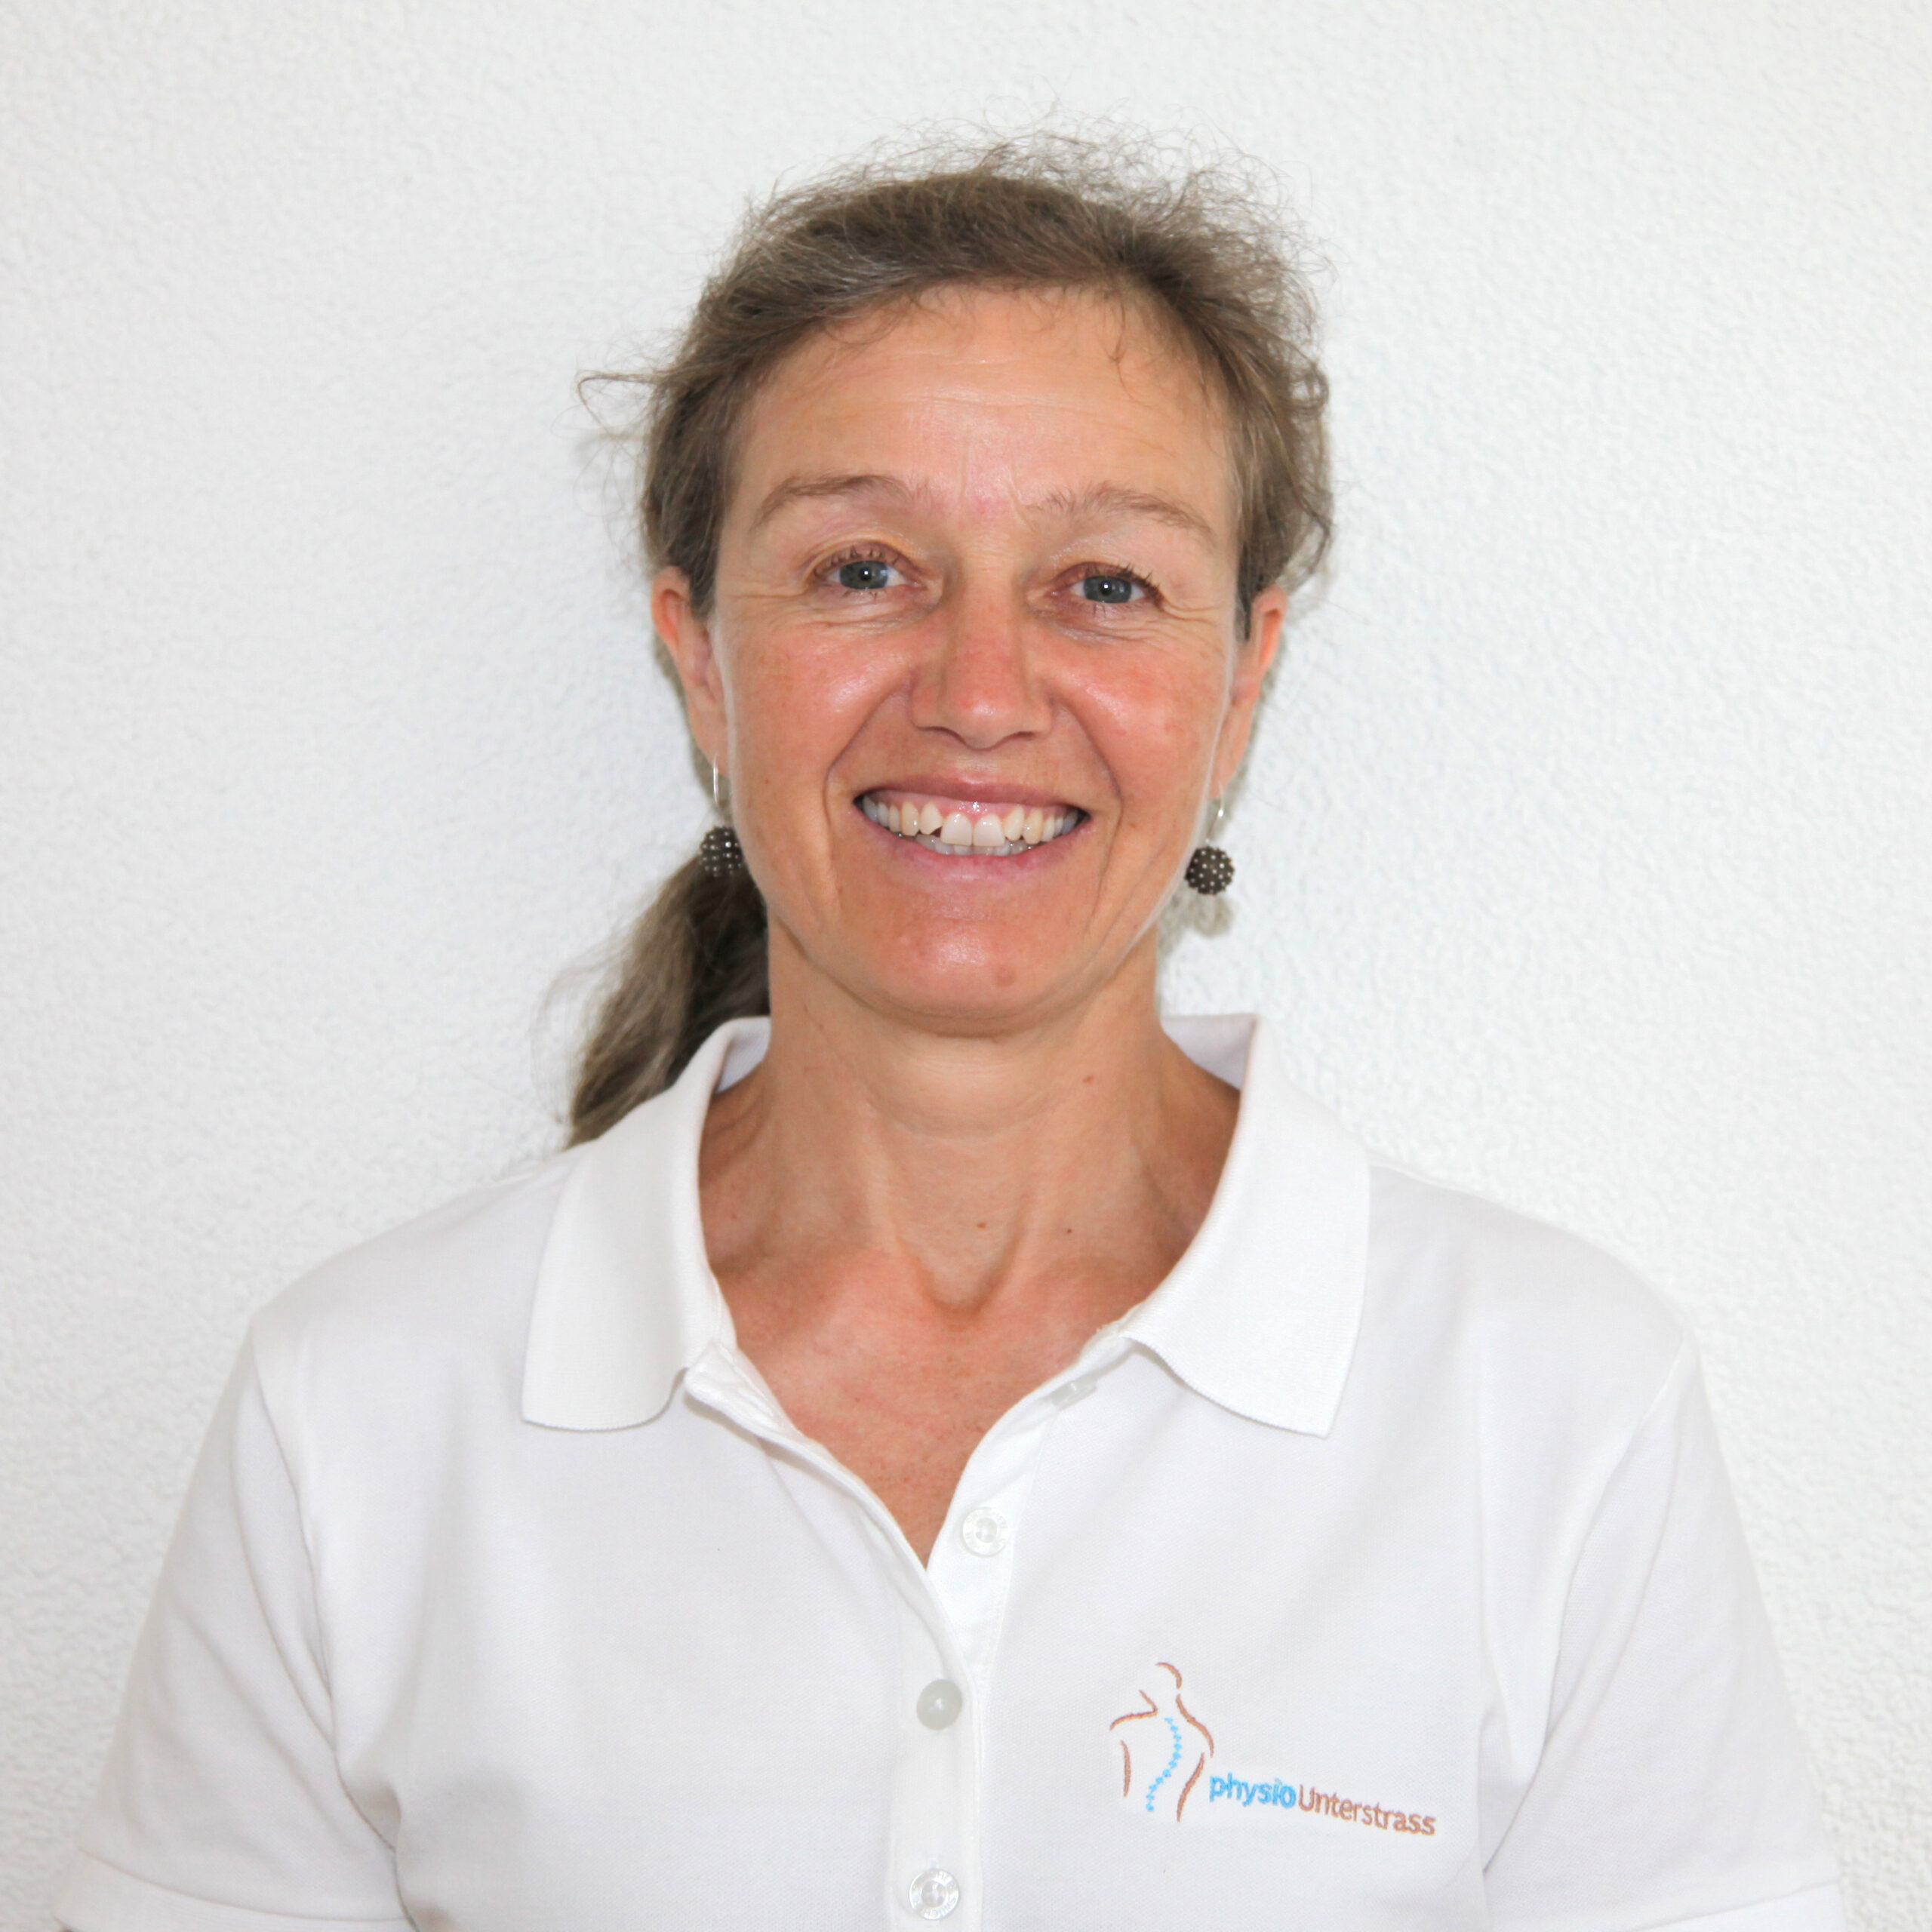 Stefi Dalla Torre, Physiotherapeutin Physioterapie Unterstrass Zürich